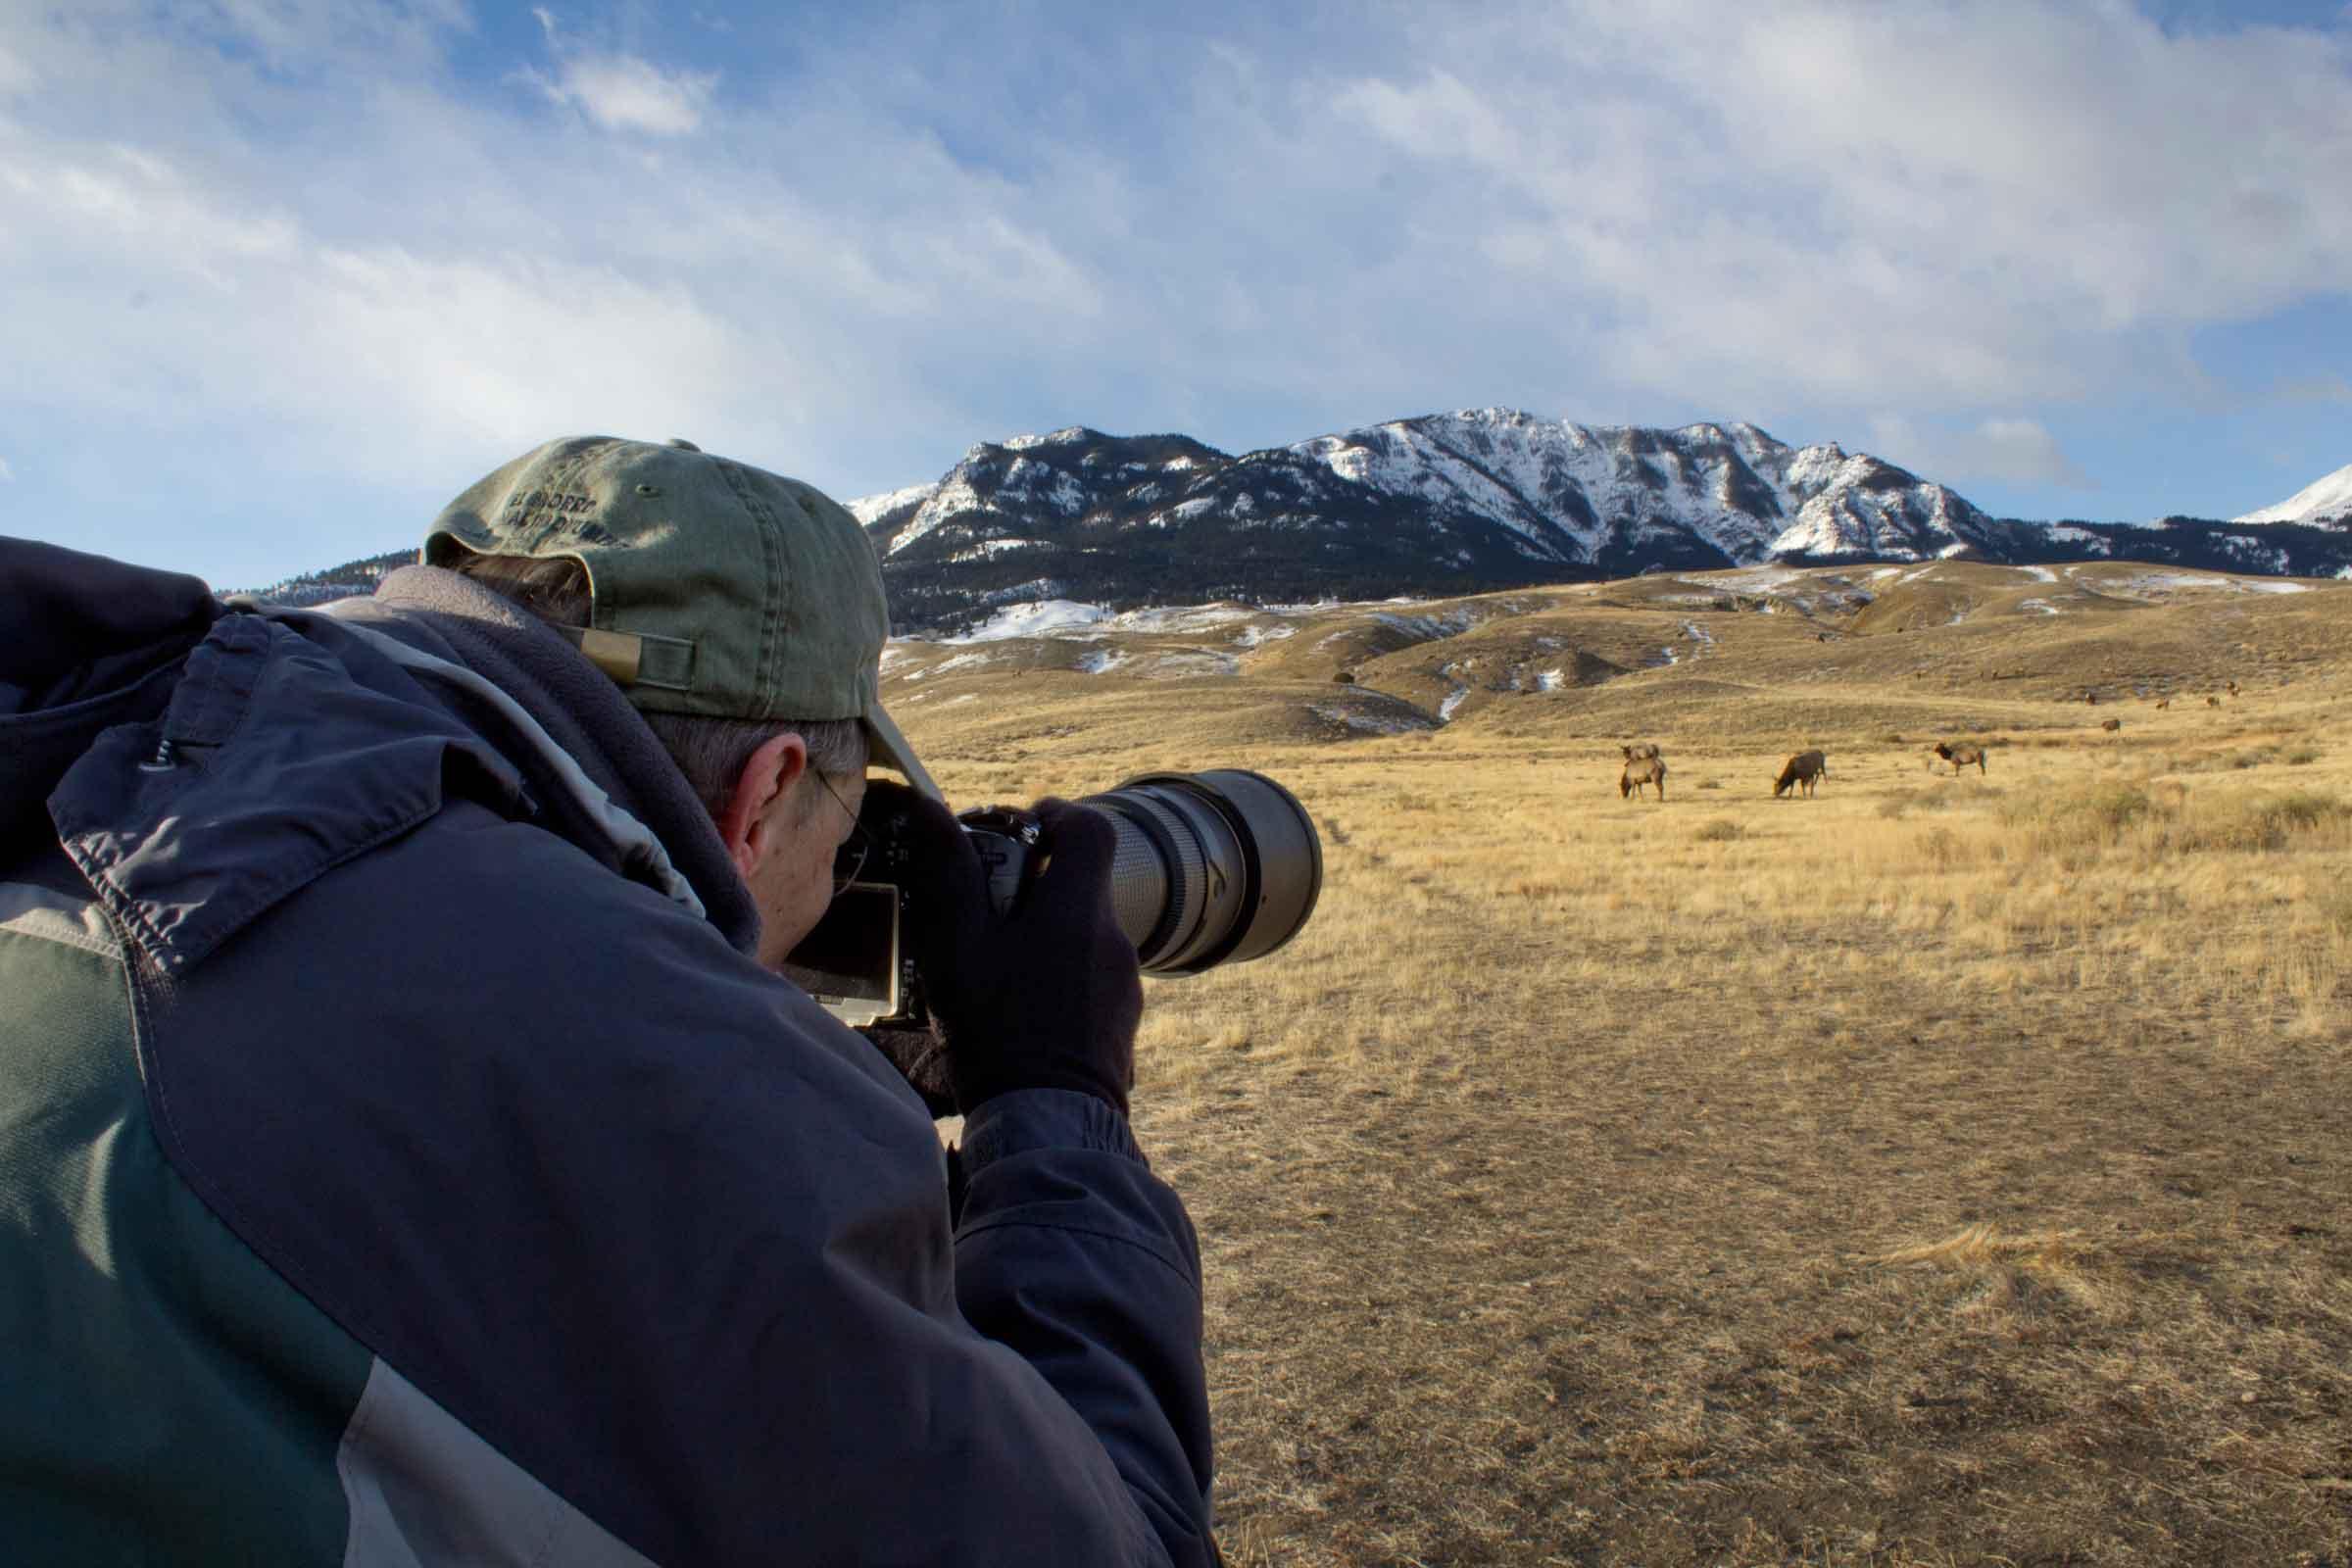 wildlife yellowstone photographing national park amazing cameras steve written wake yellowstonenationalparklodges spot shots